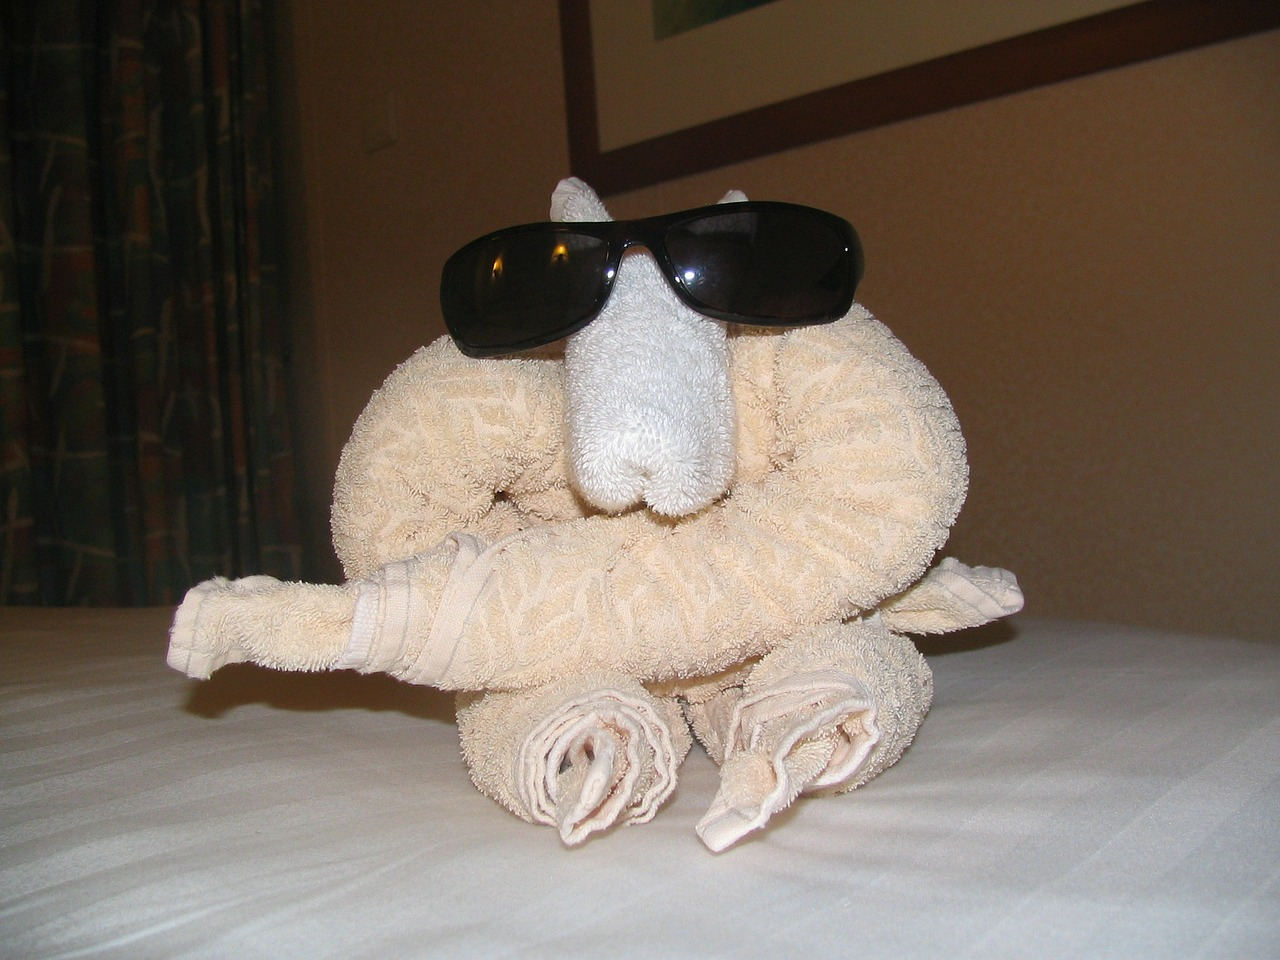 towel-animal-183211_1280.jpg